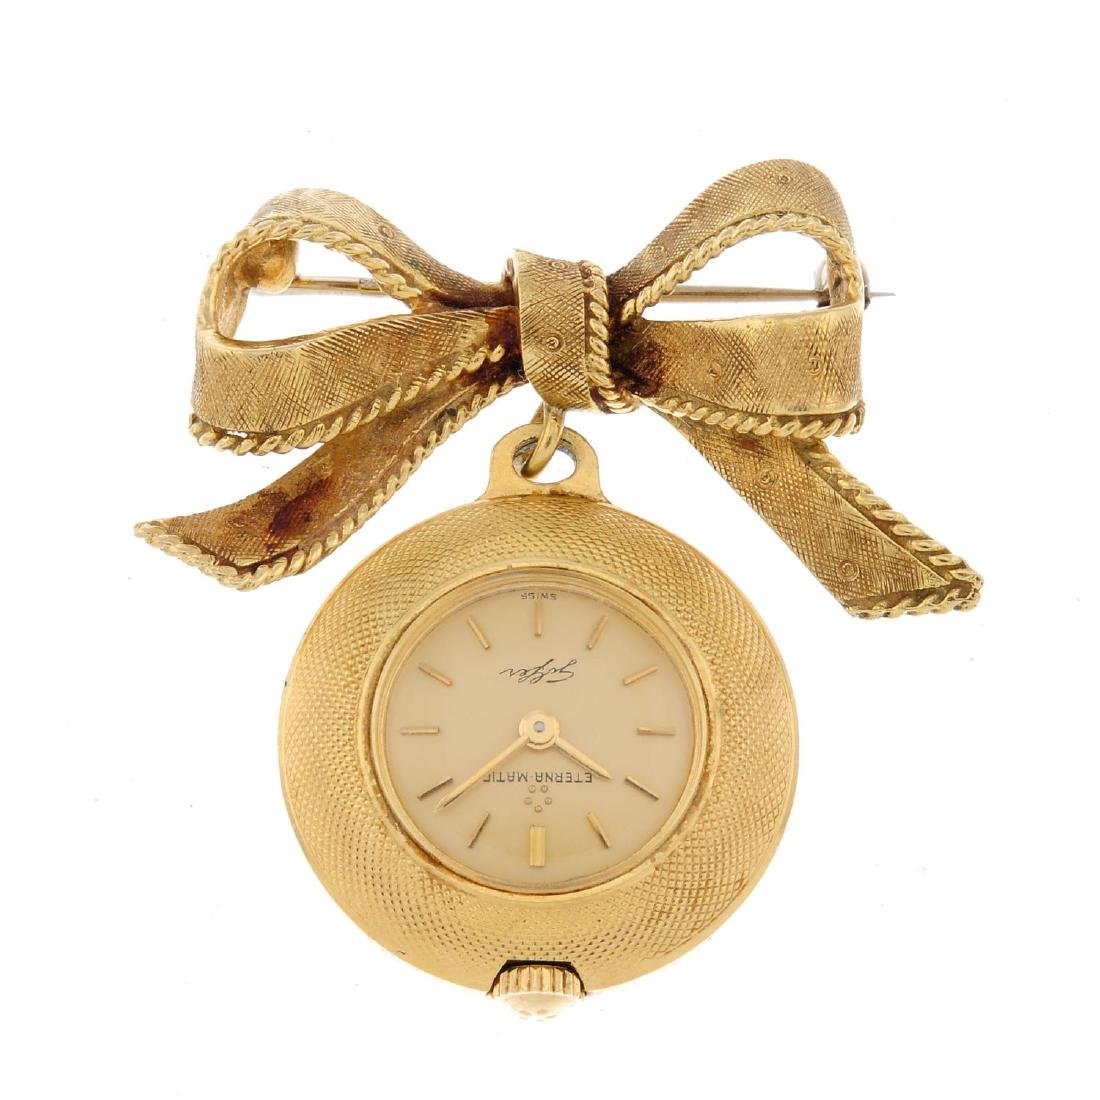 An open face pendent watch by Eterna. Yellow metal case